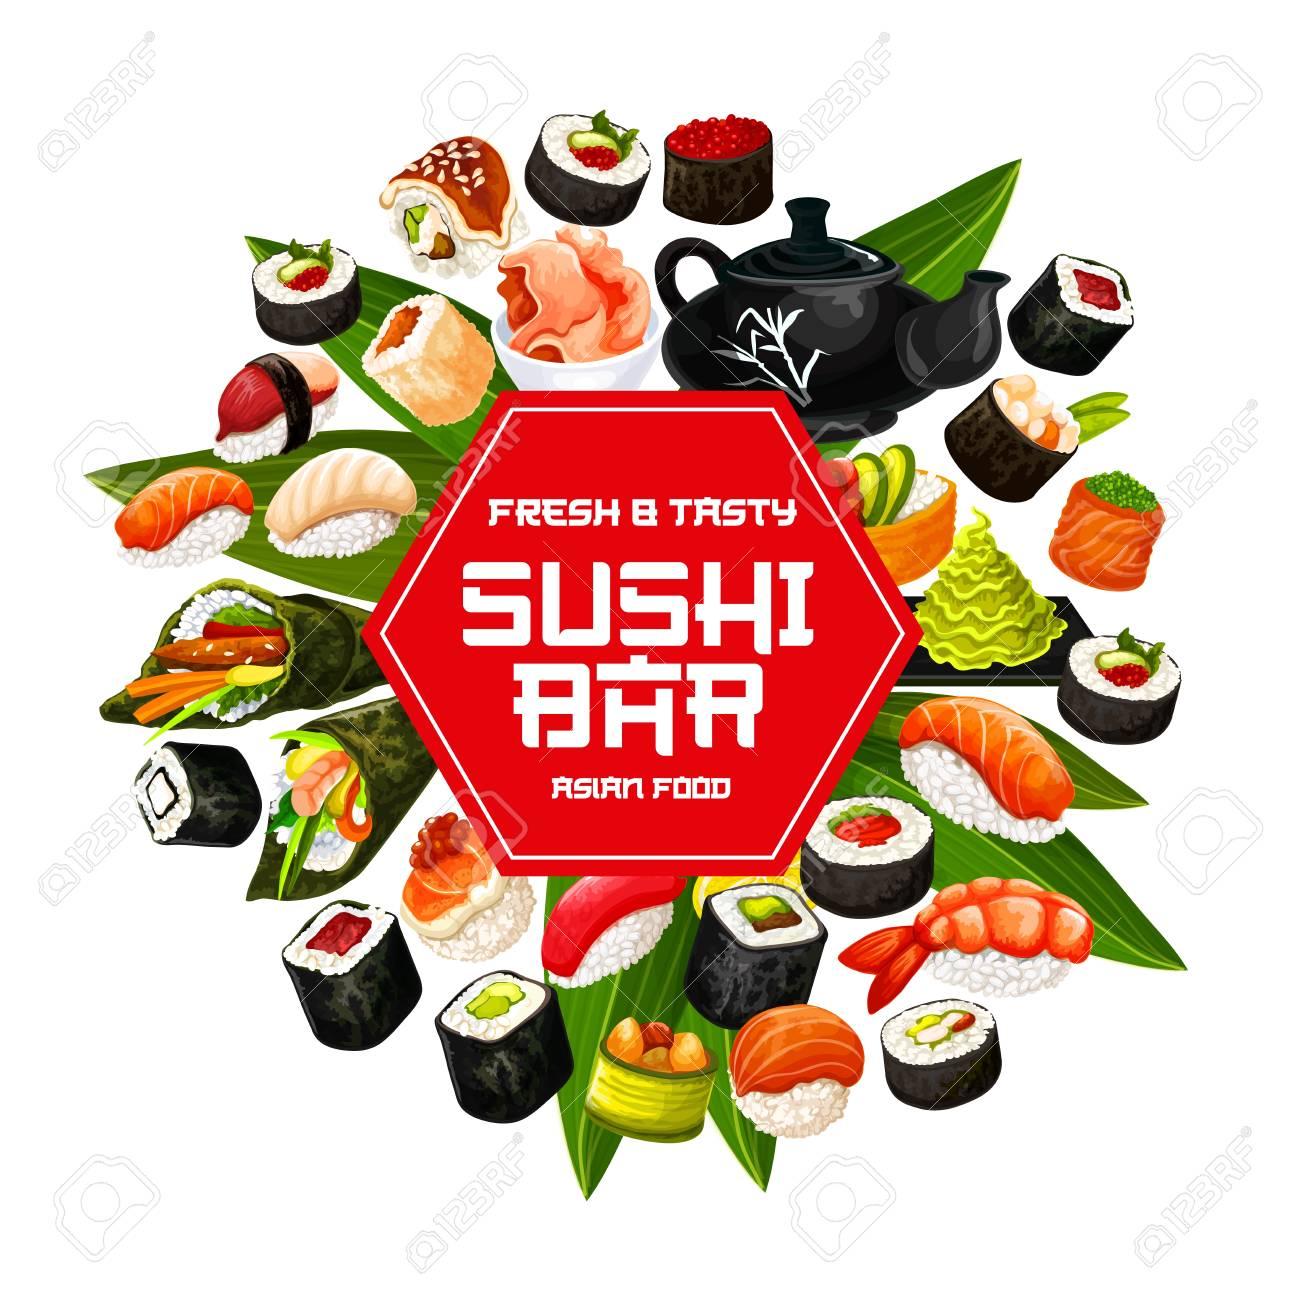 Japanese sushi bar poster. - 121246182